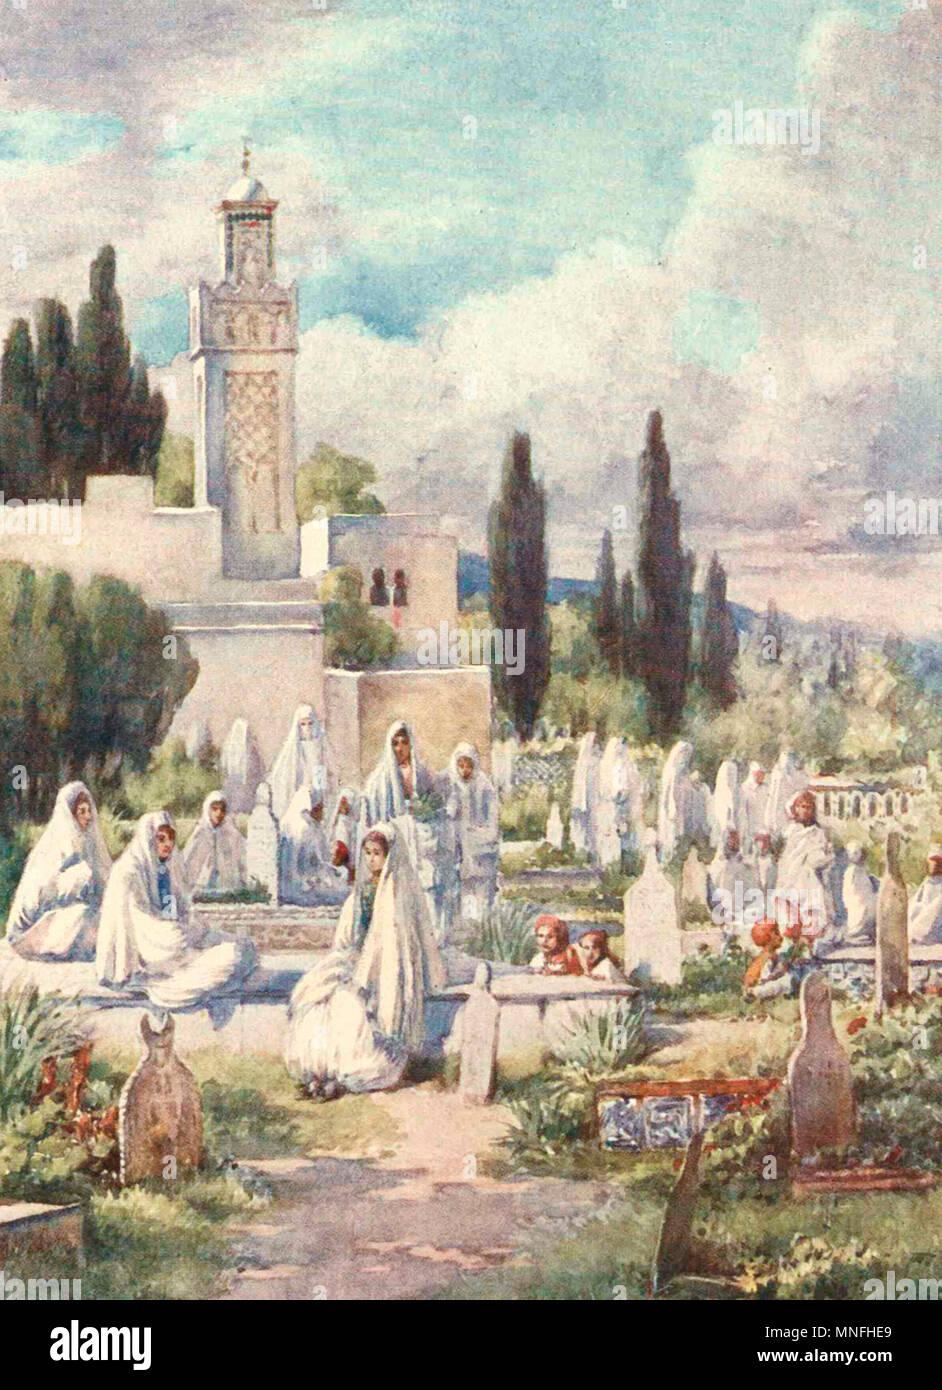 Friday at the Cemetery, Algiers, Algeria, circa 1906 - Stock Image